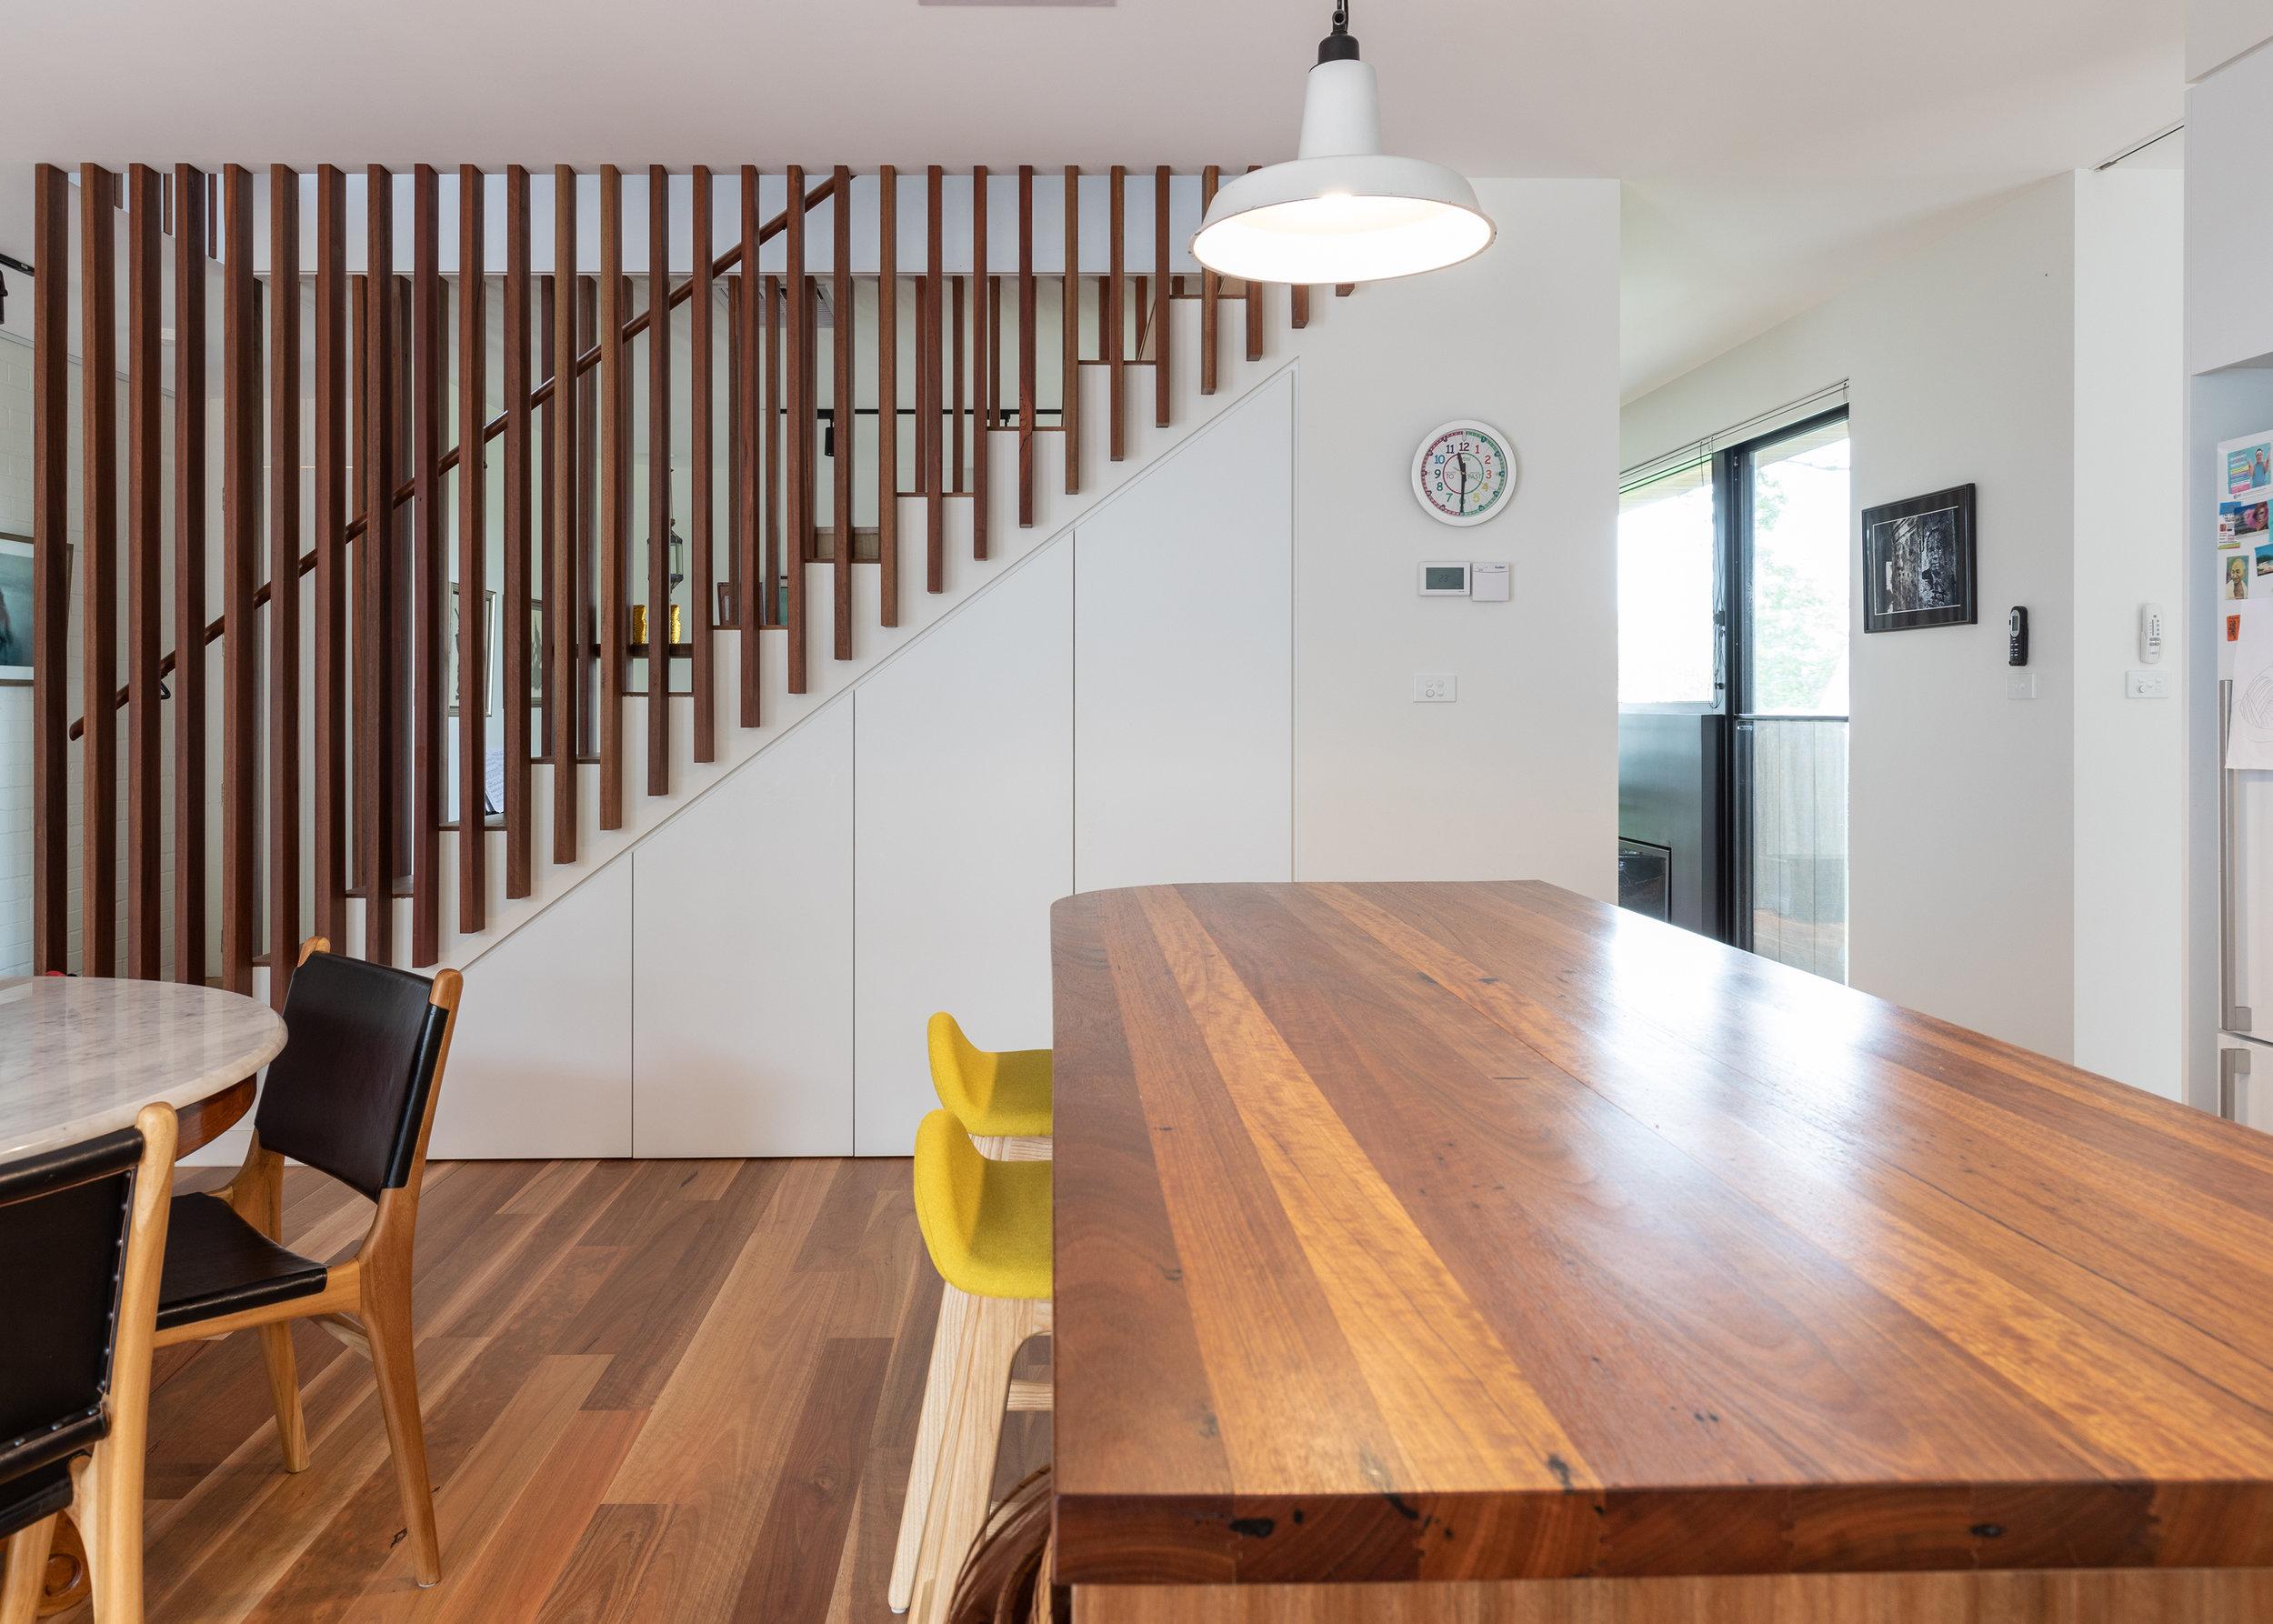 2917-resnew_Ribbon House_Rob Henry Architects_Light Studies_06.jpg